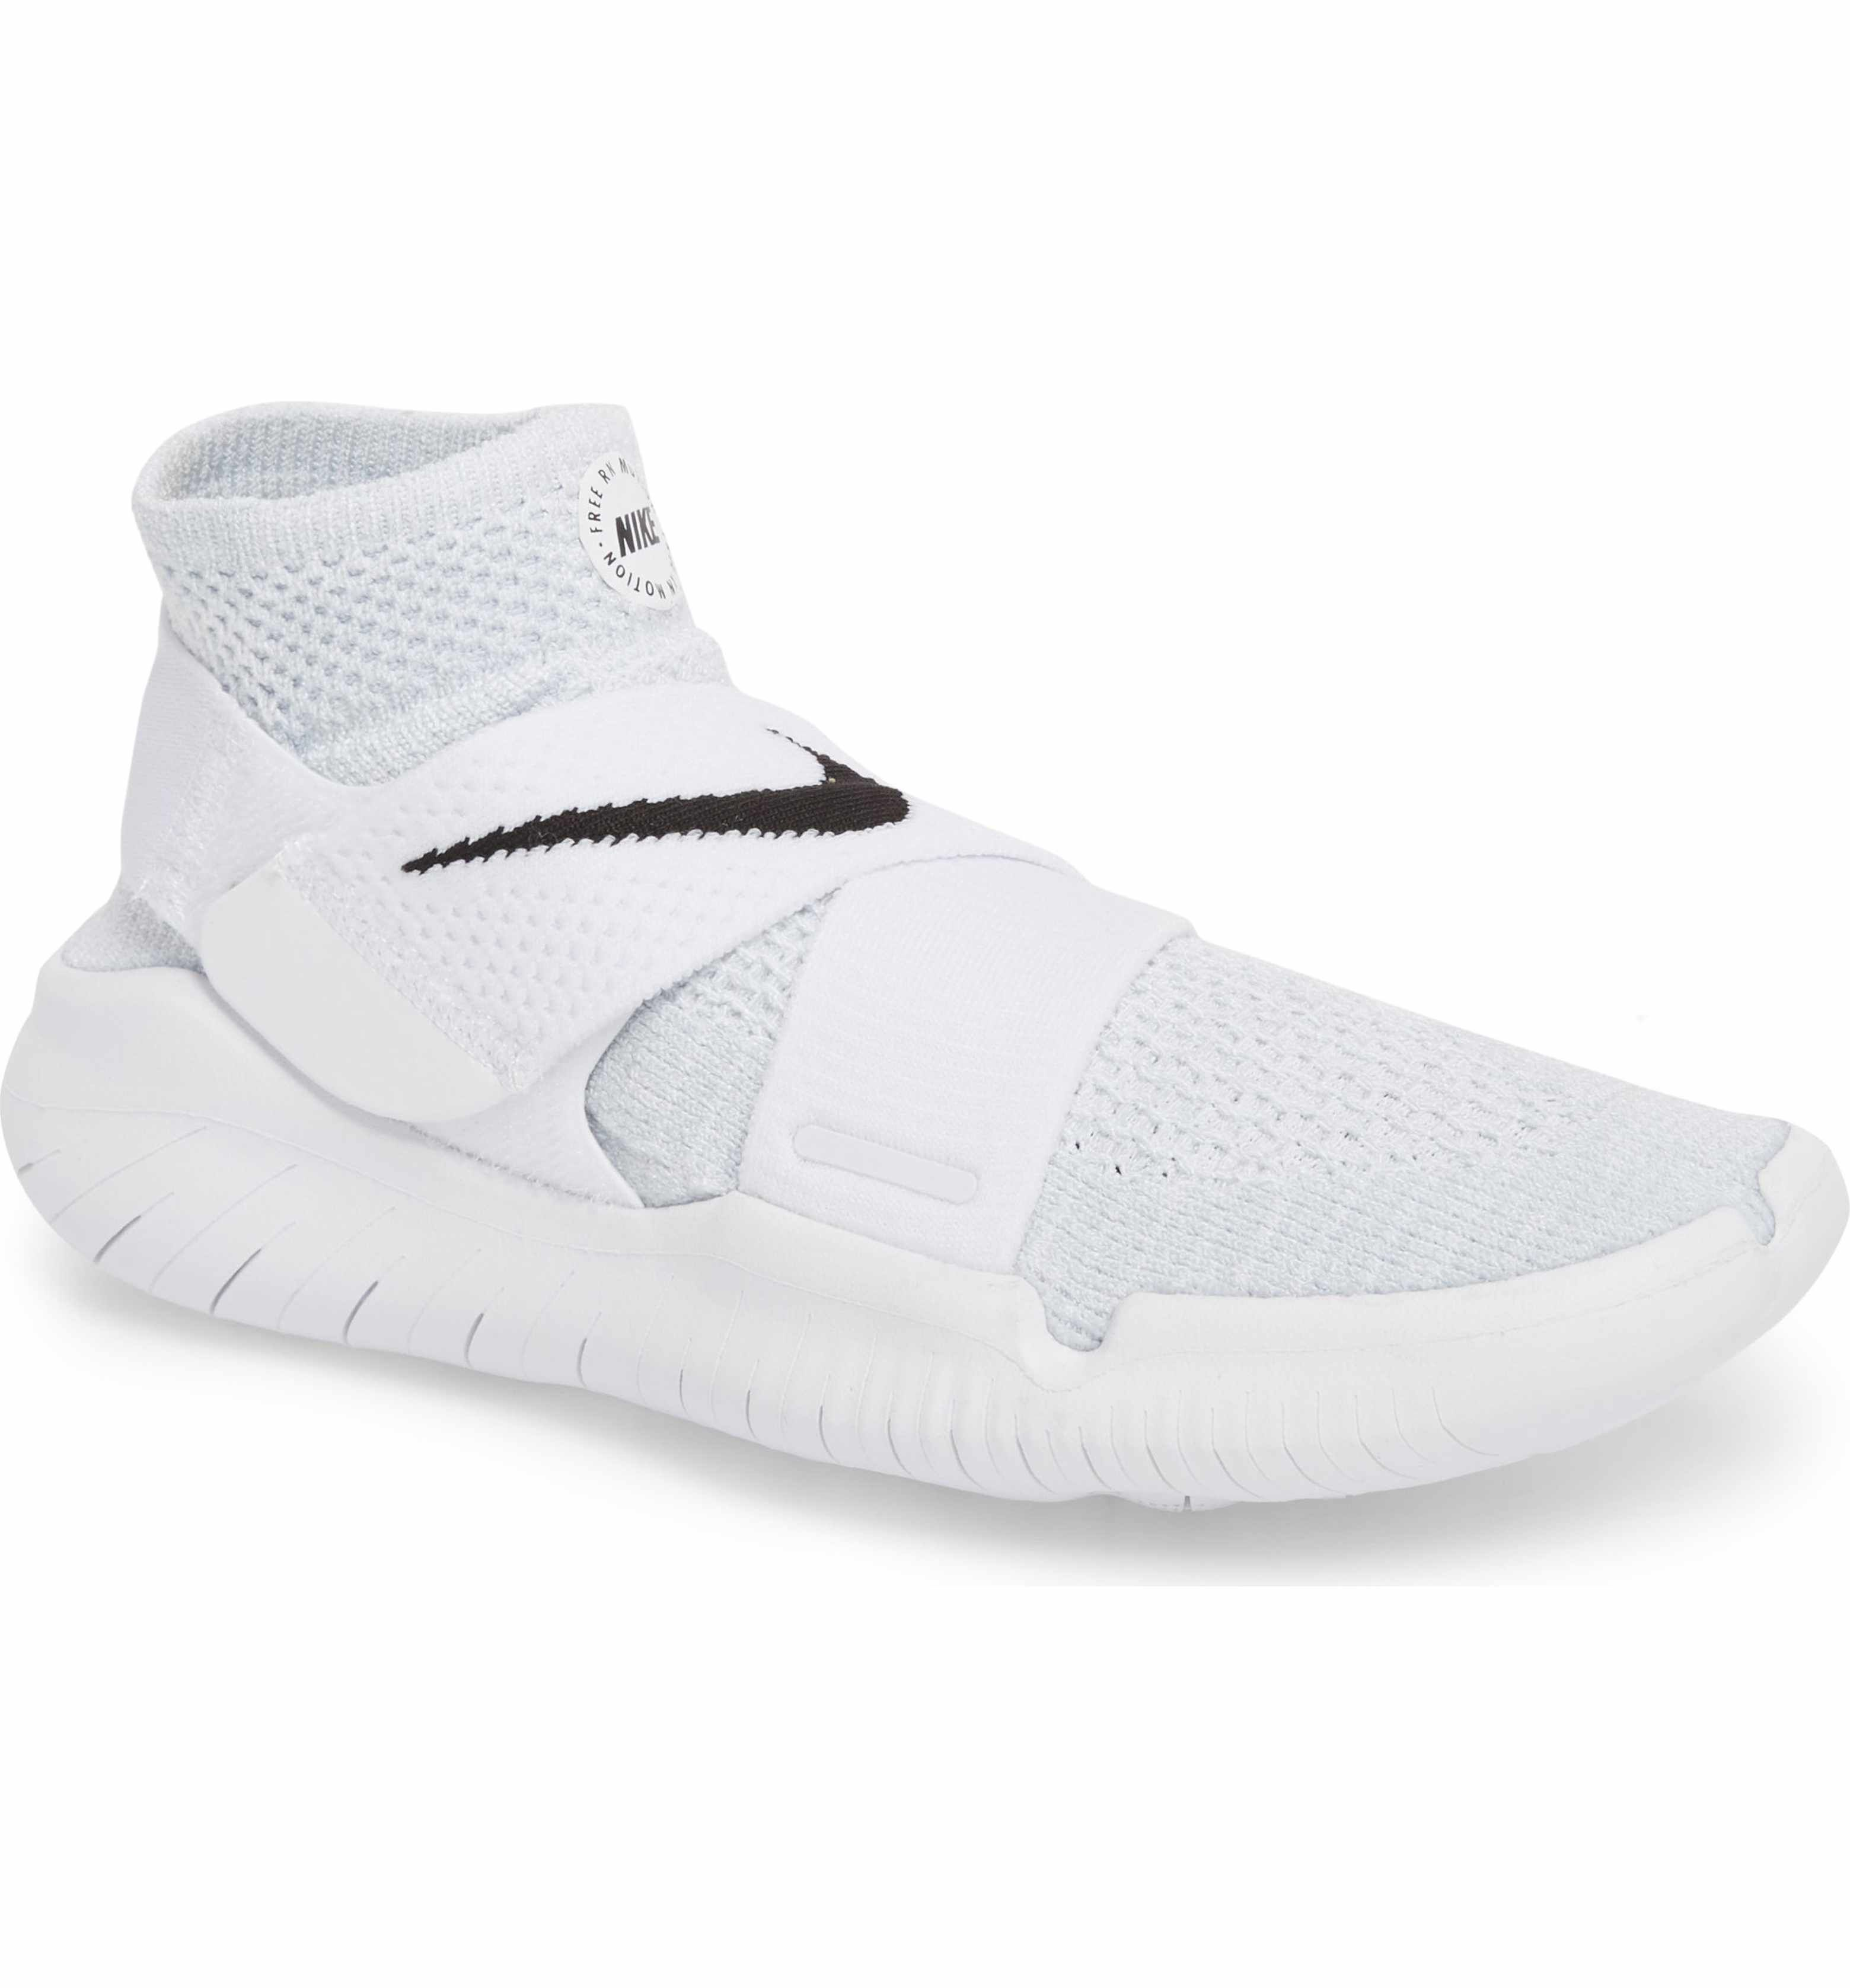 official photos c84f4 c51cc Main Image - Nike Free RN Motion Flyknit 2018 Running Shoe (Women)